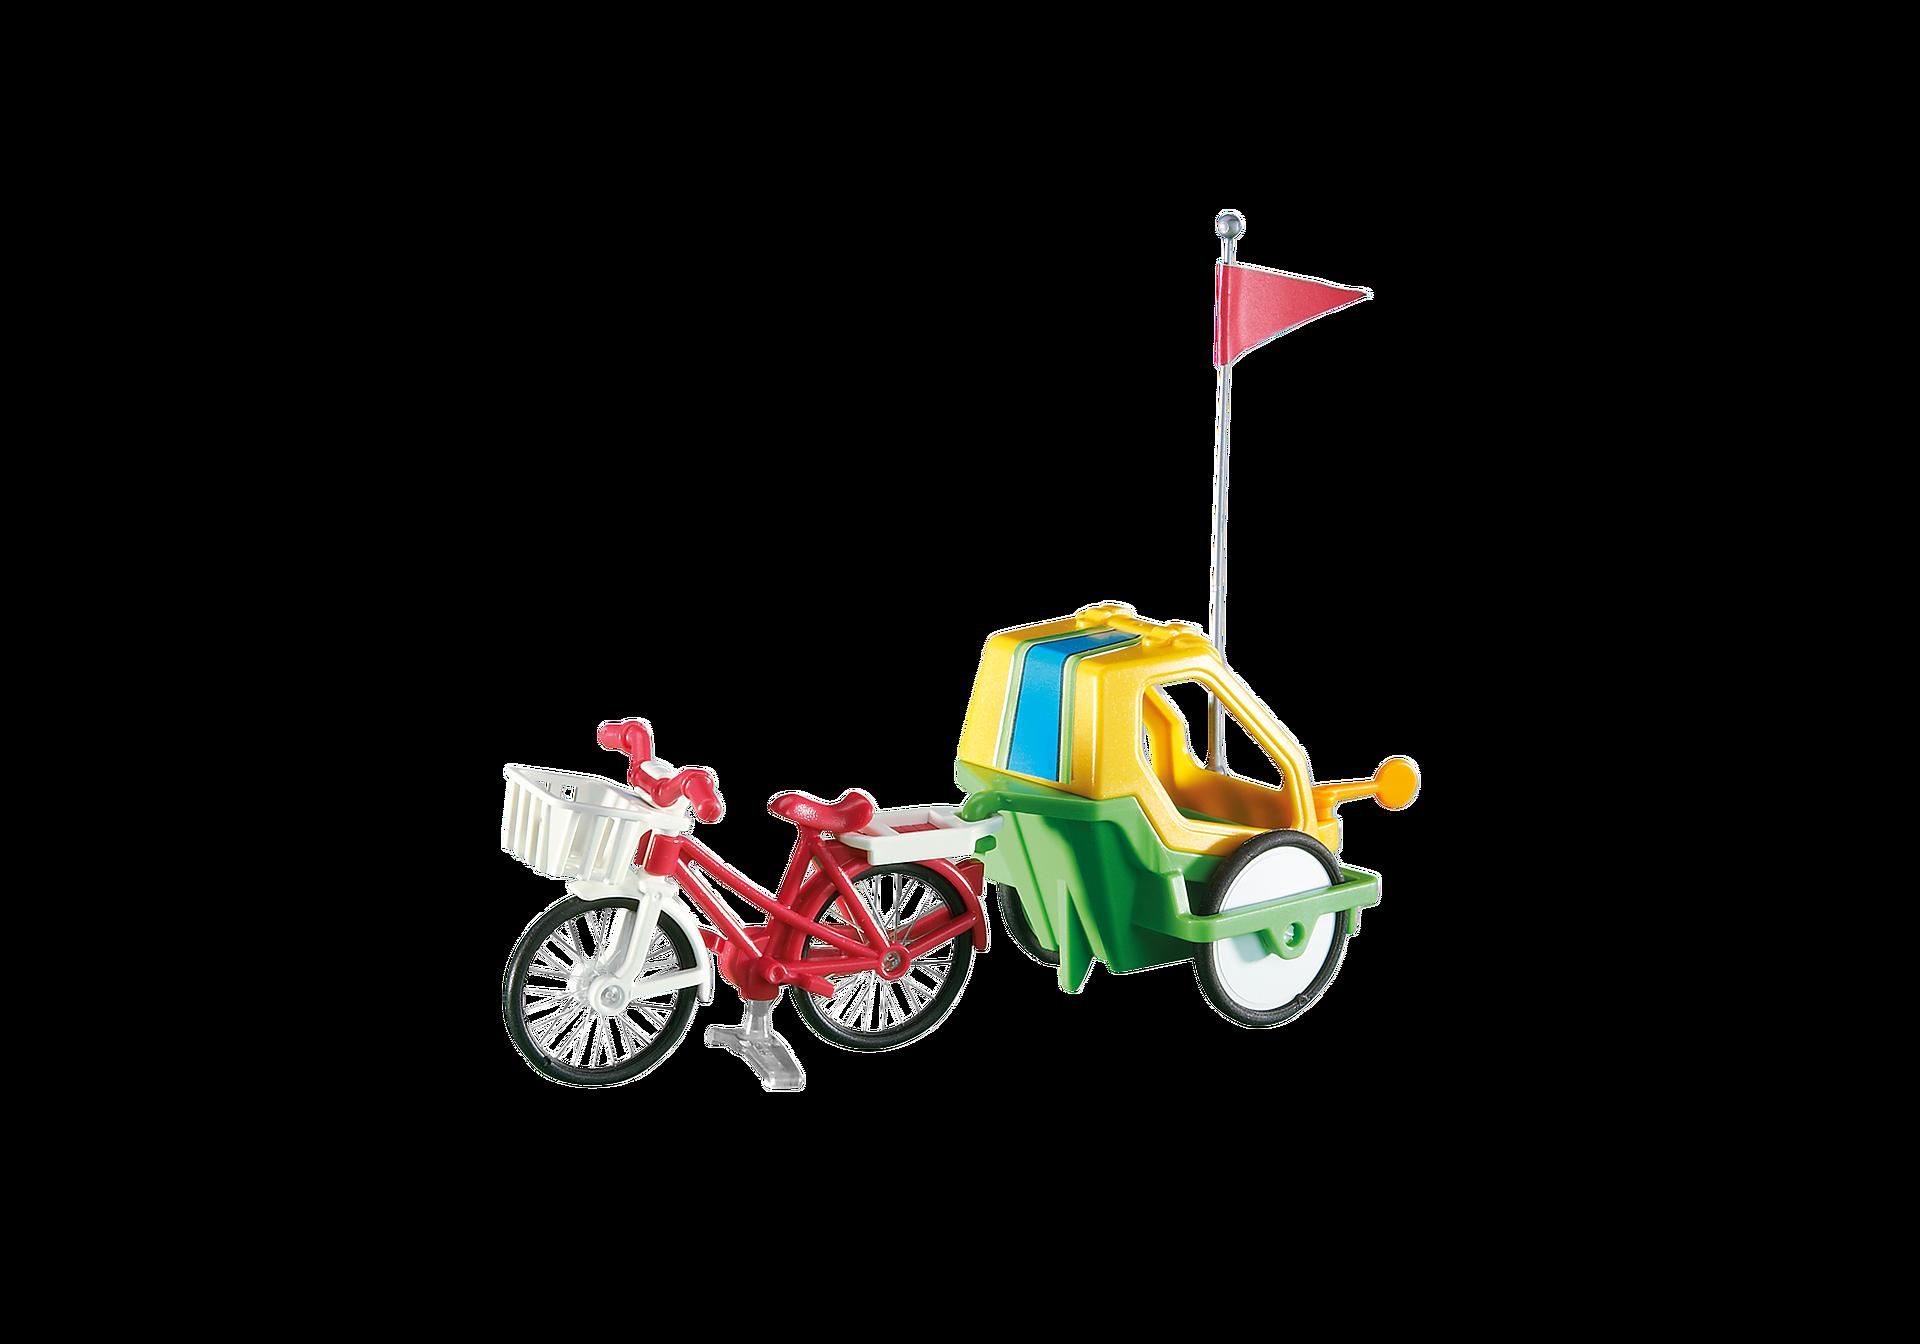 http://media.playmobil.com/i/playmobil/6388_product_detail/Vélo avec remorque pour enfant